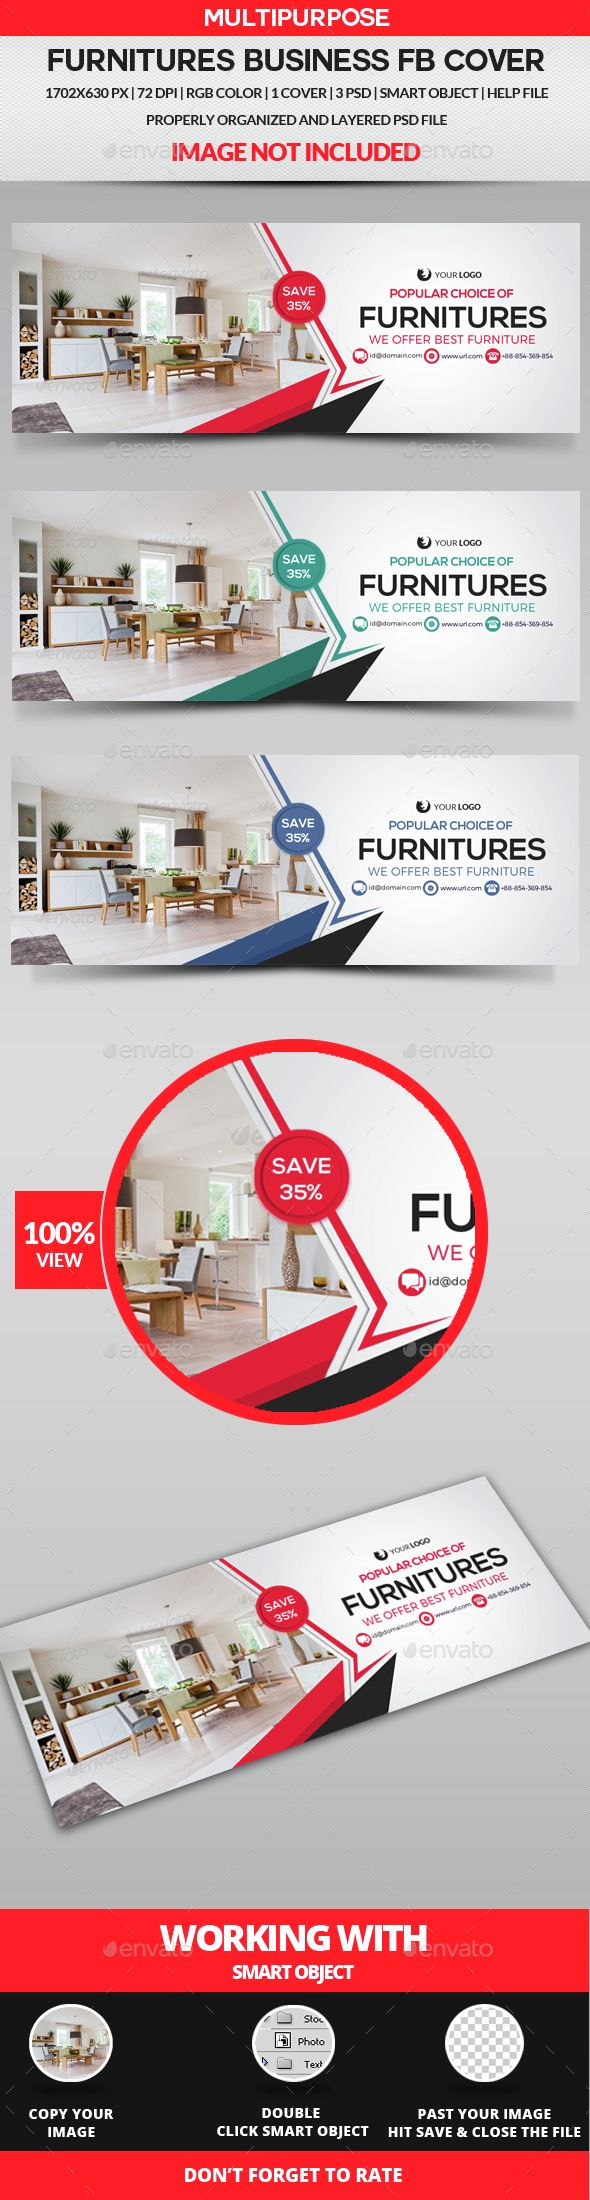 Furniture Facebook Cover Template PSD. Download here: http://graphicriver.net/item/furniture-facebook-cover/15412548?ref=ksioks